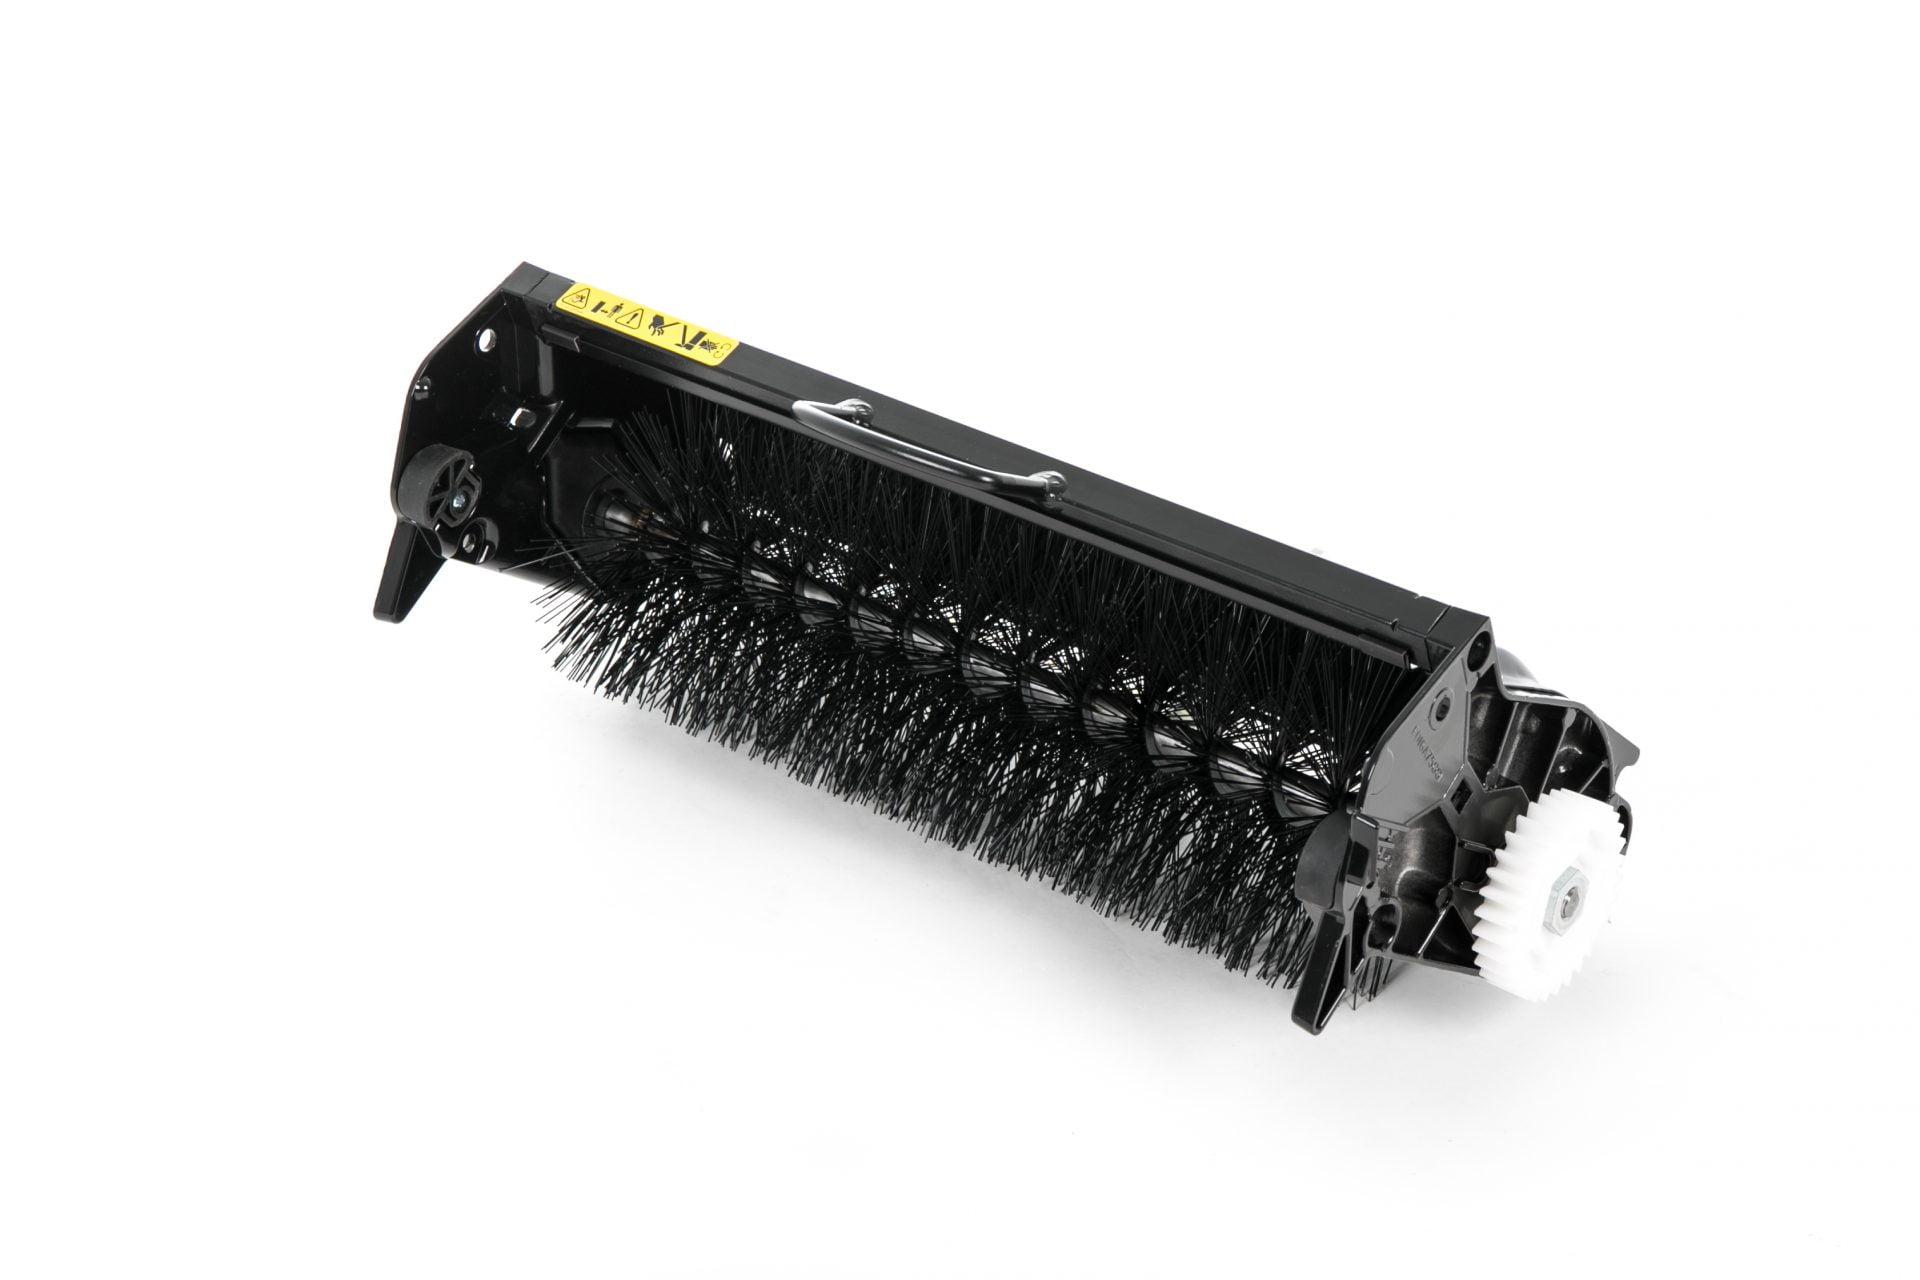 Allett 14 inch Grooming Lawn Brush Quick Change Cartridge